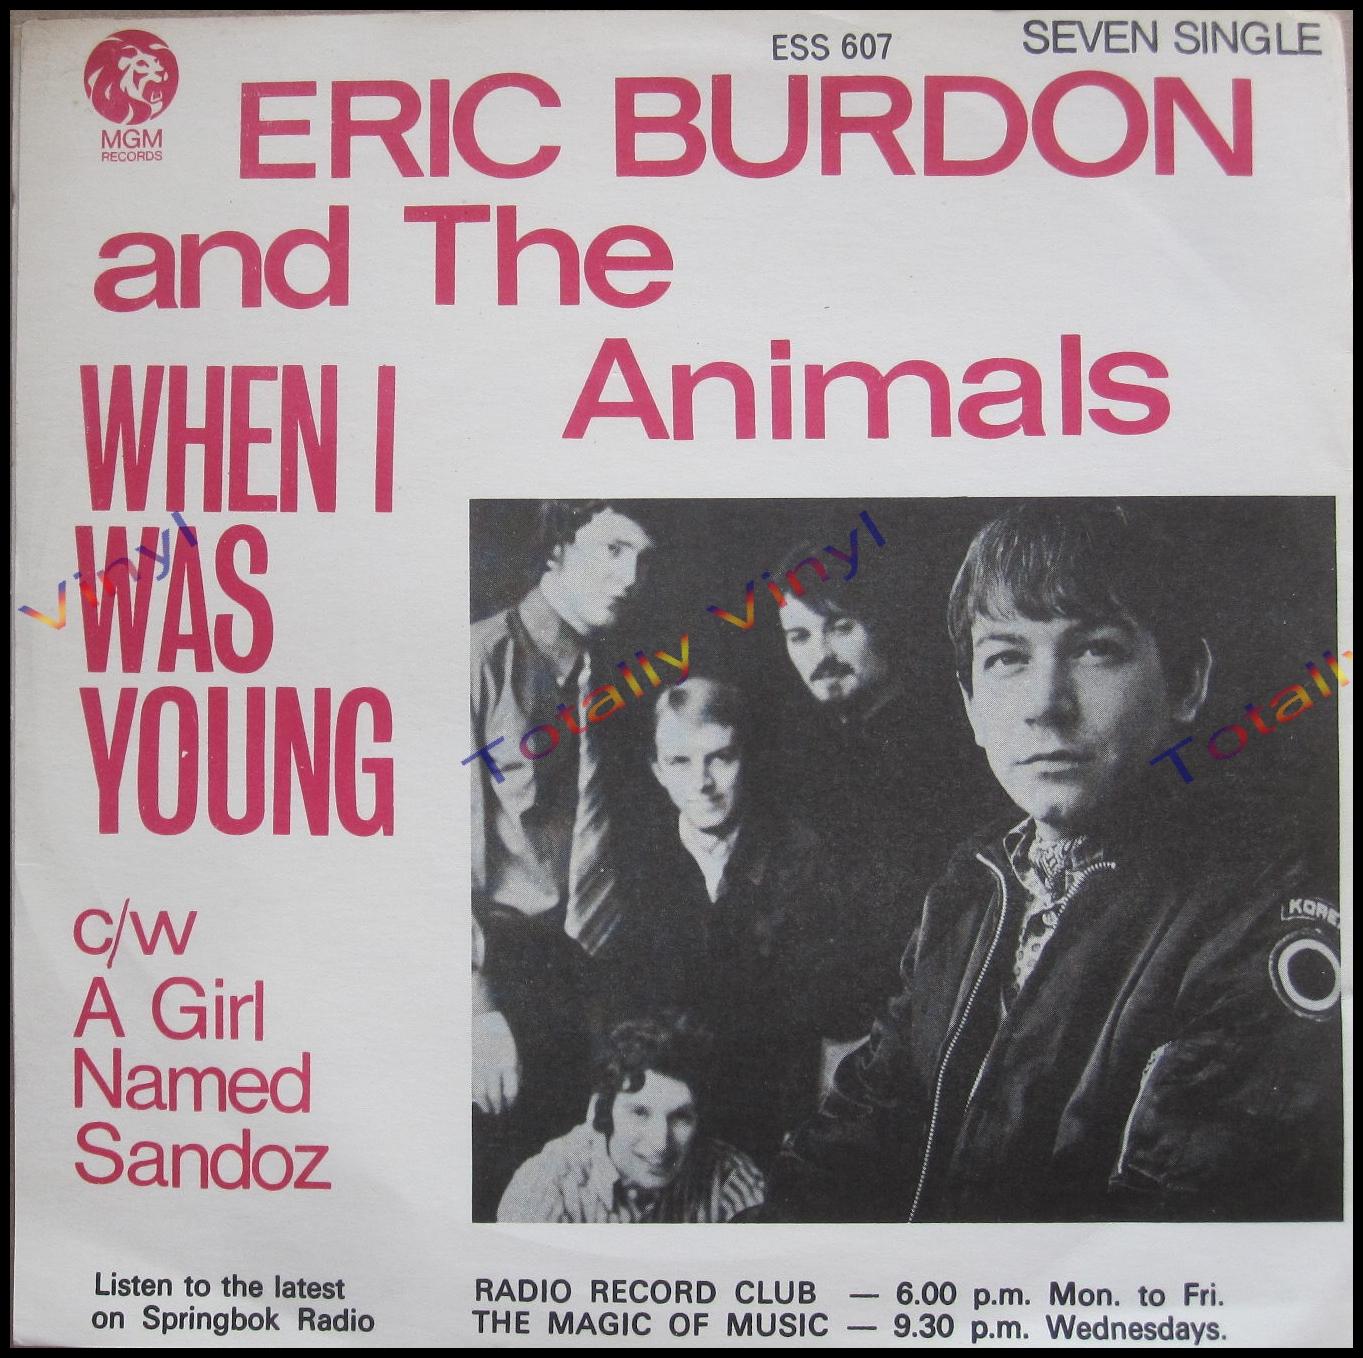 Totally Vinyl Records Burdon And The Animals Eric